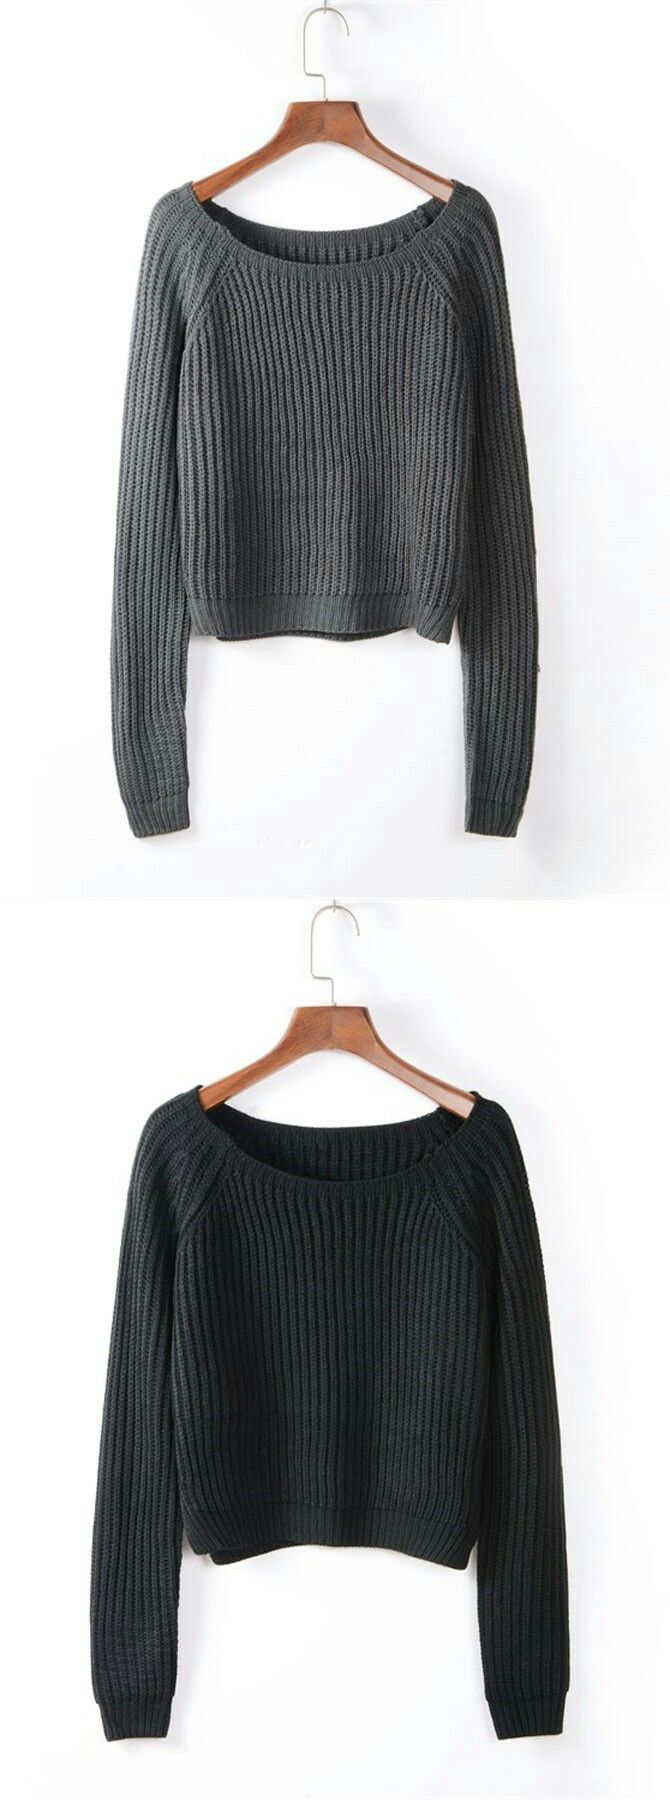 Short Round Neck Cotton Medium Black Sweater | Outfit winter ...